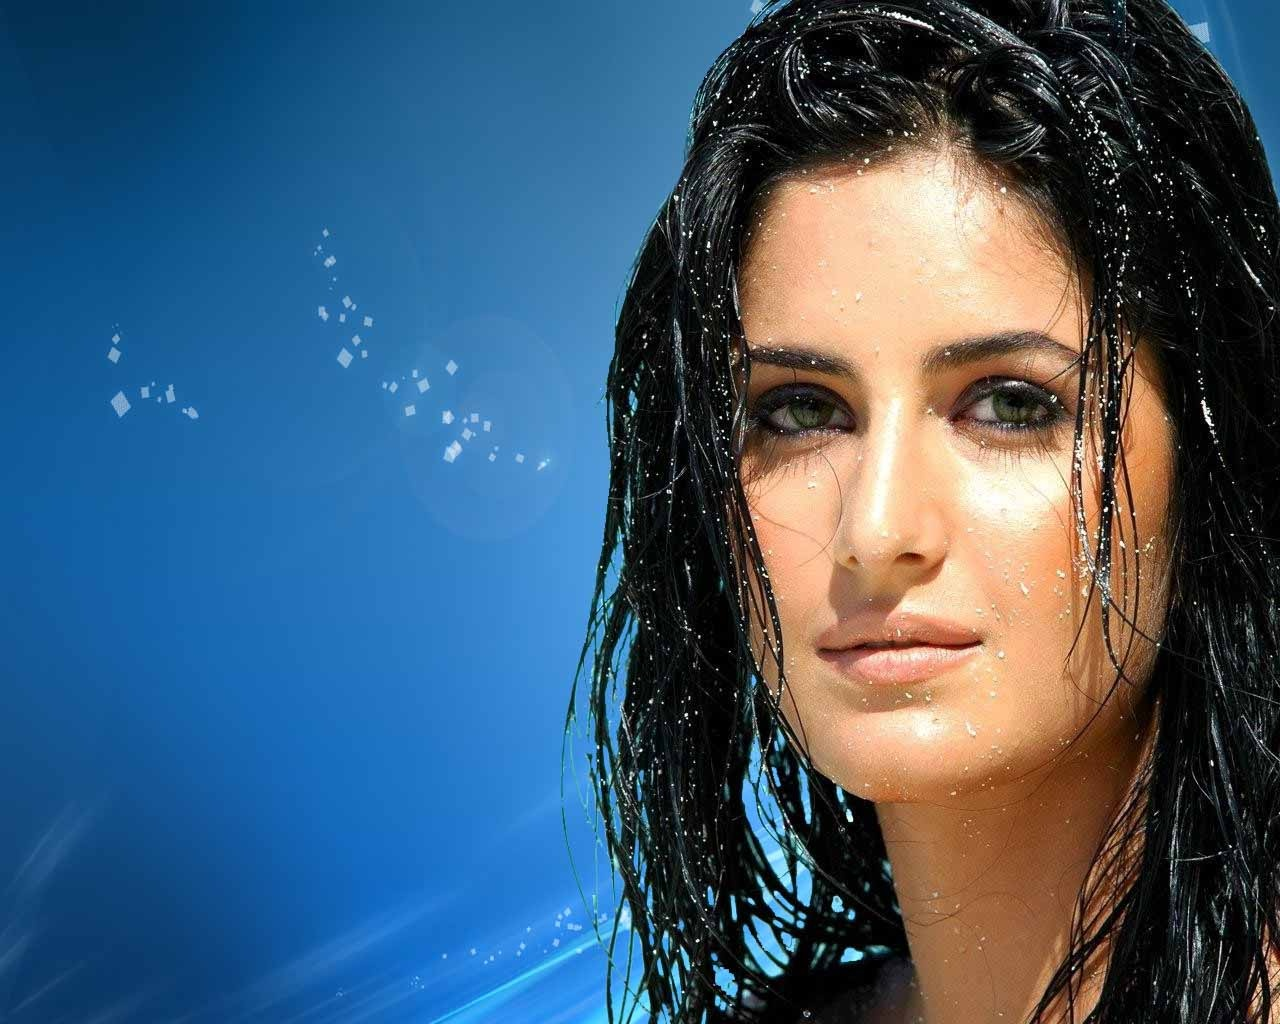 Katrina kaif bollywood girl wallpapers in jpg format for - Indian actress wallpaper download ...